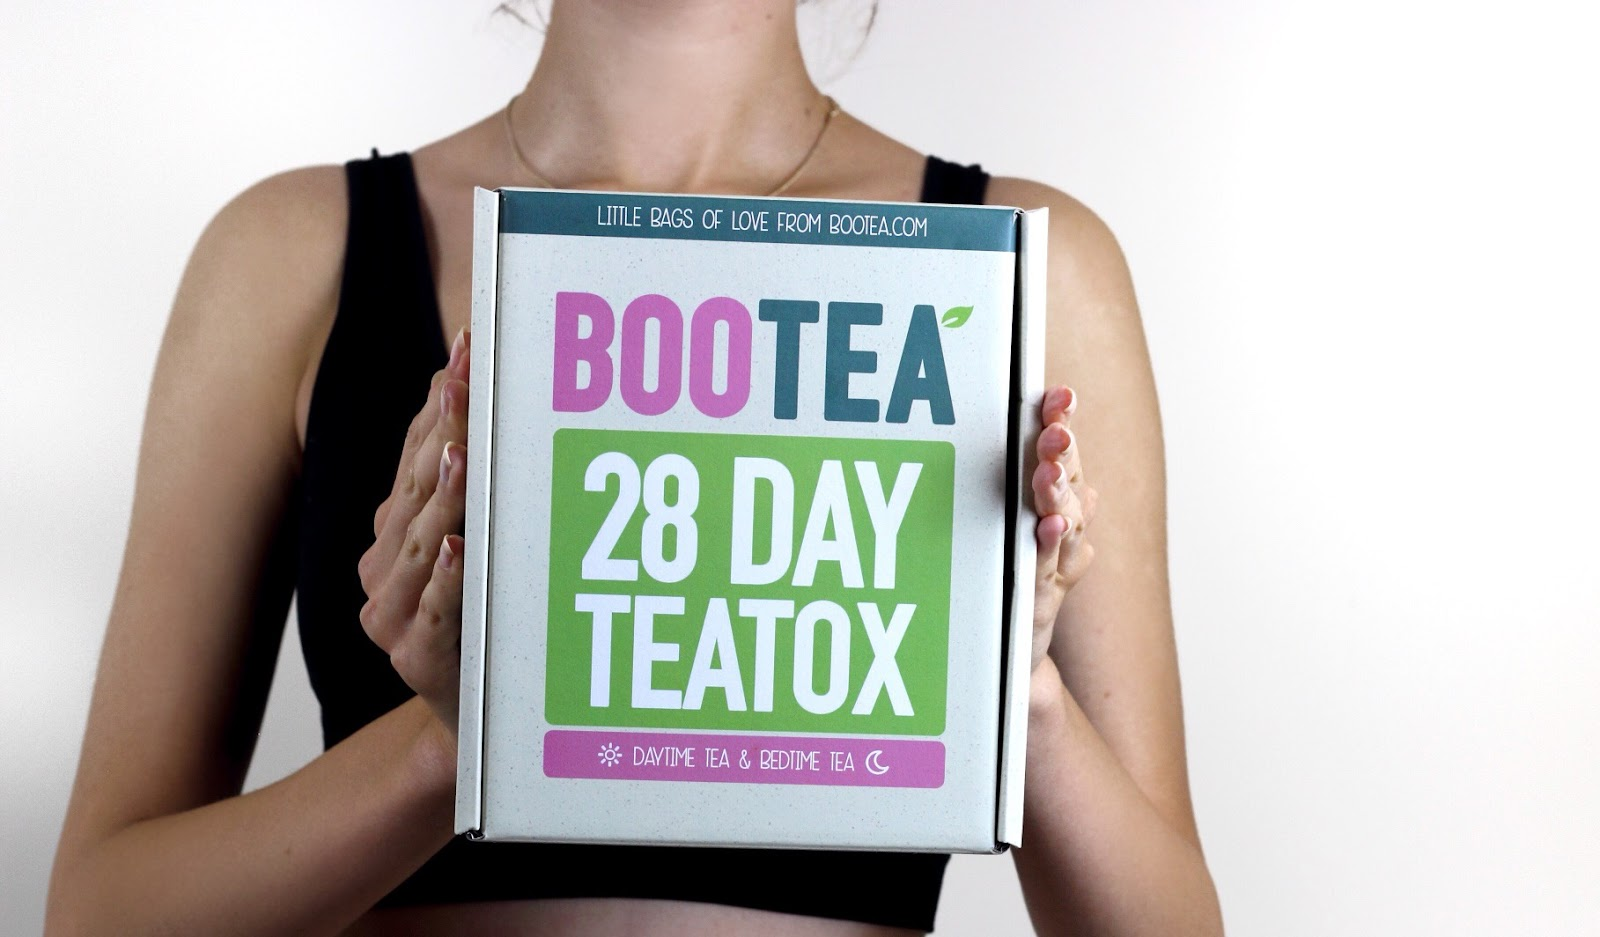 bootea, bootea teatox, teatox, cleanse, detoxing, detox, healthy, healthy living, healthy cleanse, lifestyle, lifestyle blogger, anasofiachic, teatox review, review, bootea review, detox review, cleanse